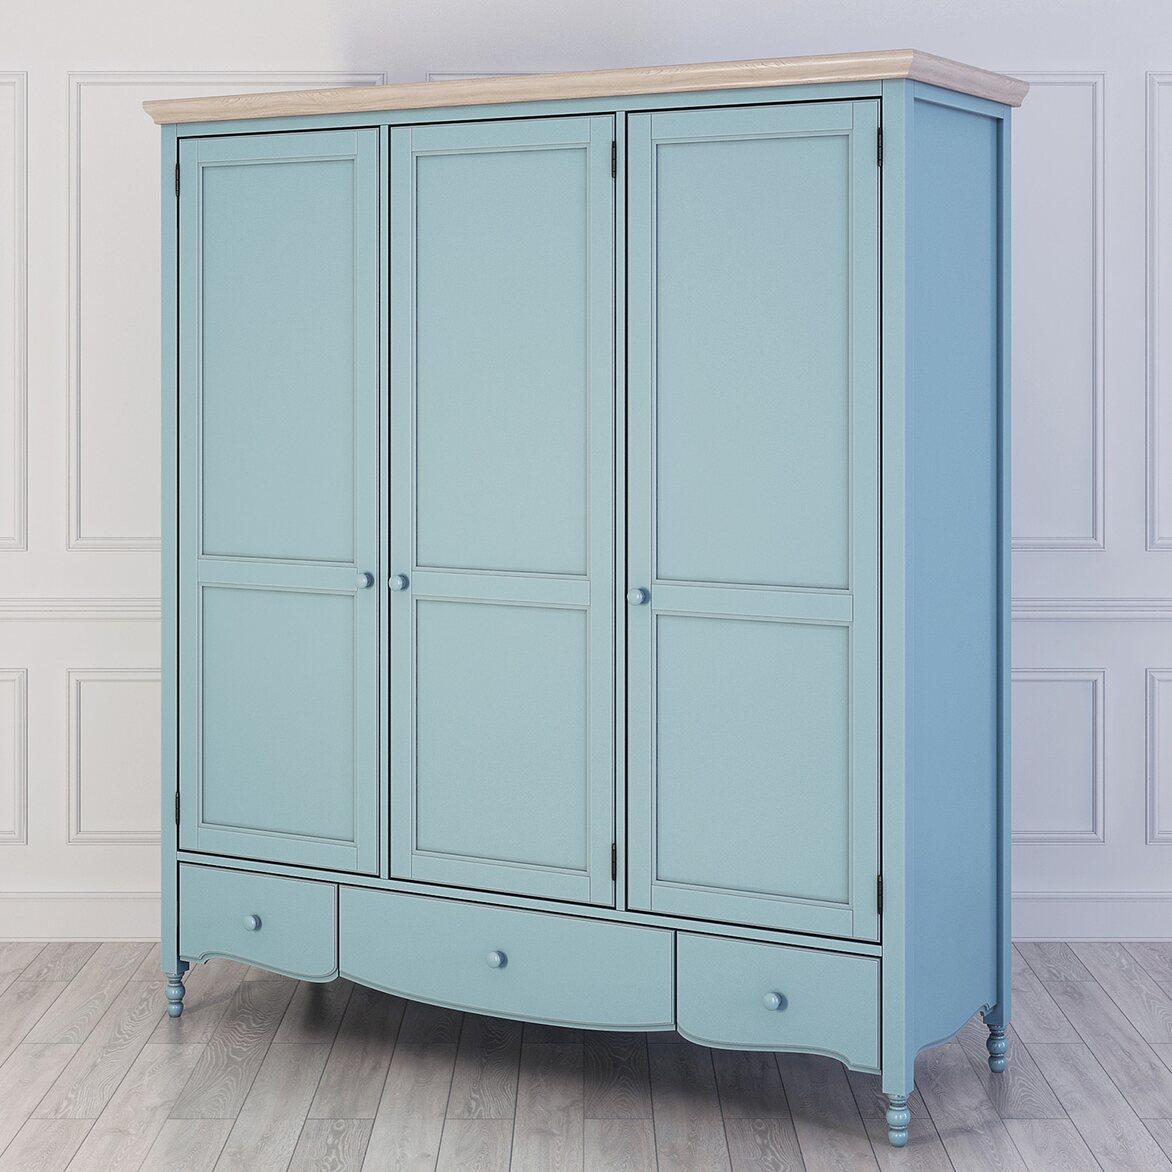 Шкаф трехстворчатый Leblanc, голубой   Платяные шкафы Kingsby